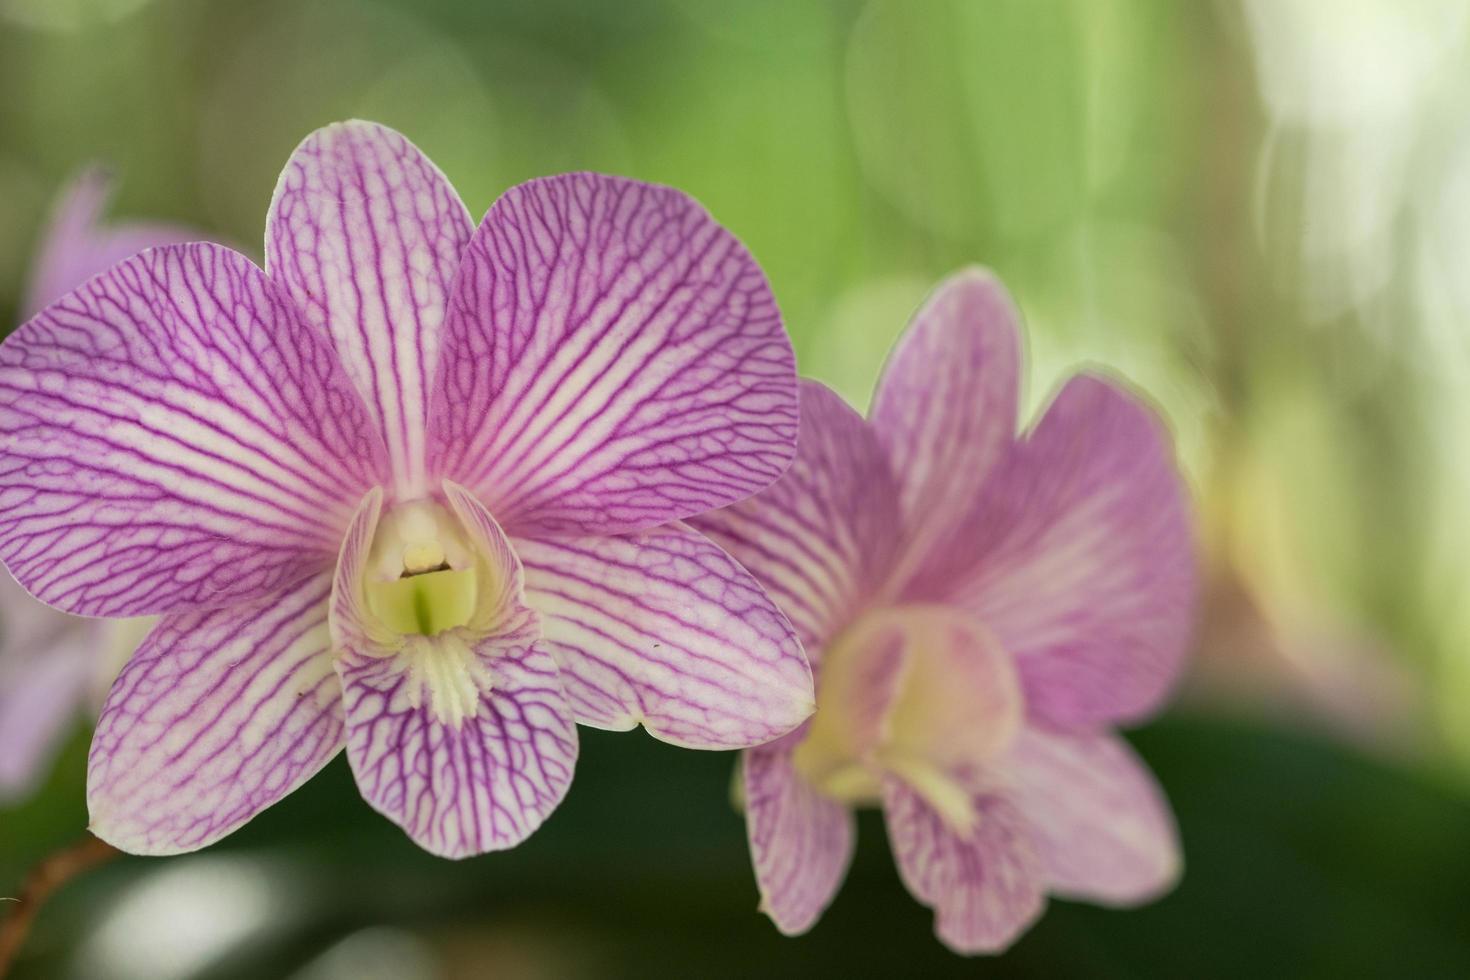 orchideebloem close-up foto